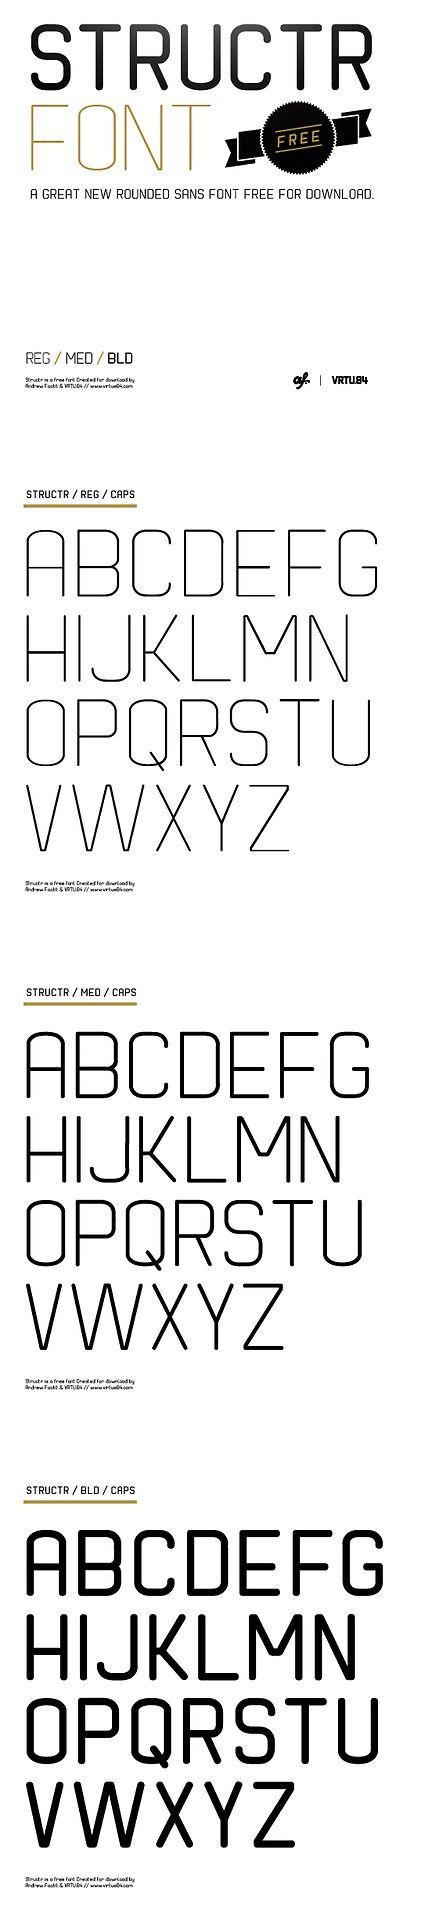 STRUCTR - Free Font